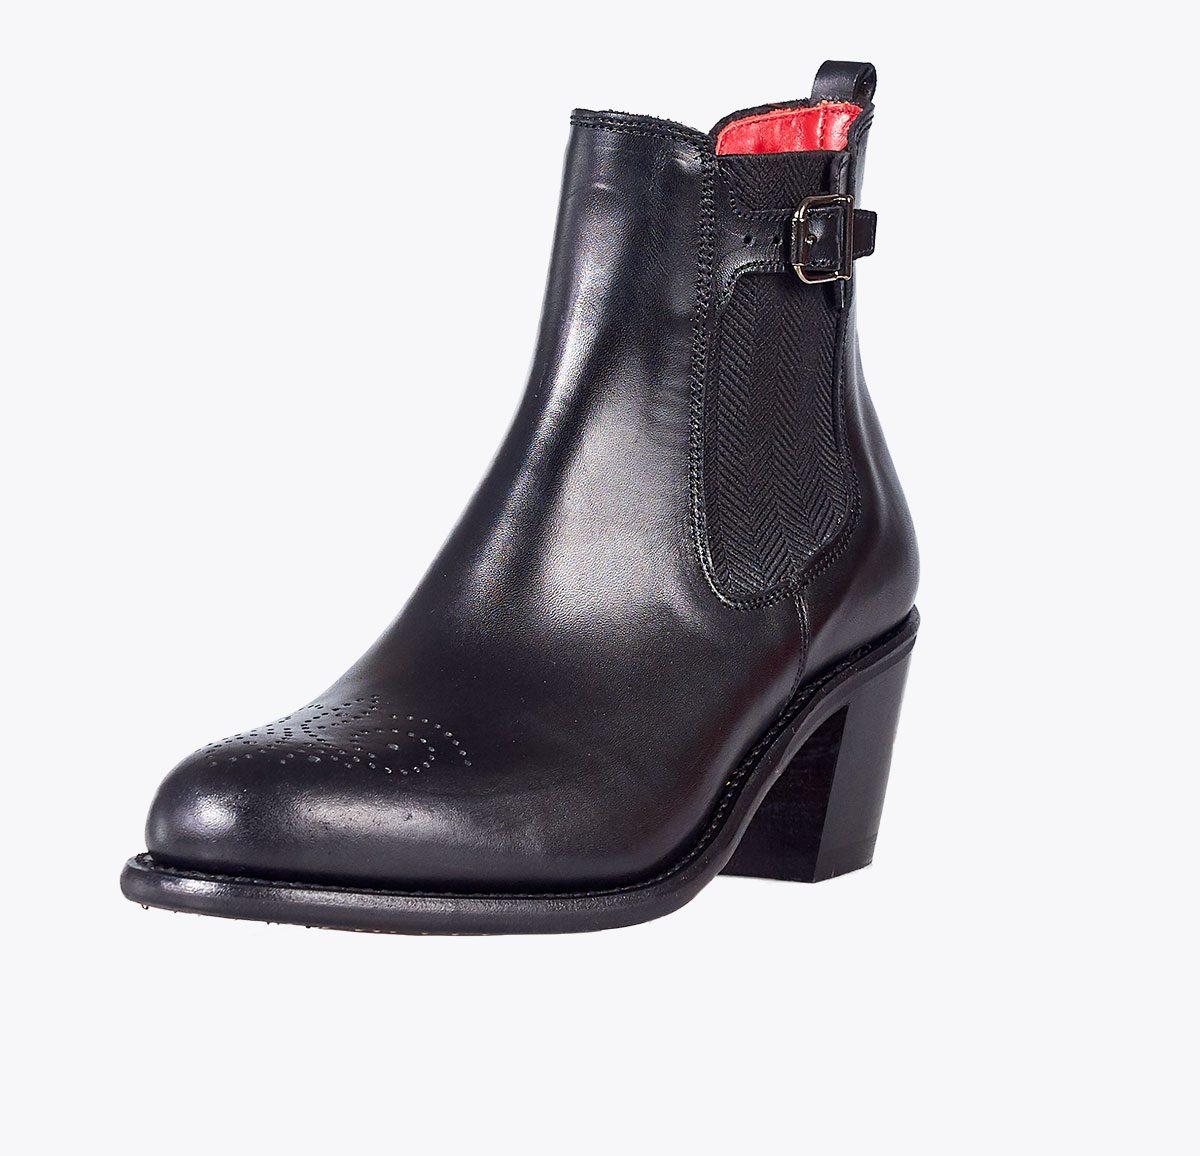 Botín Soffy, tailor made shoes, schuhe nach mass en mandalashoes Santanyí Mallorca